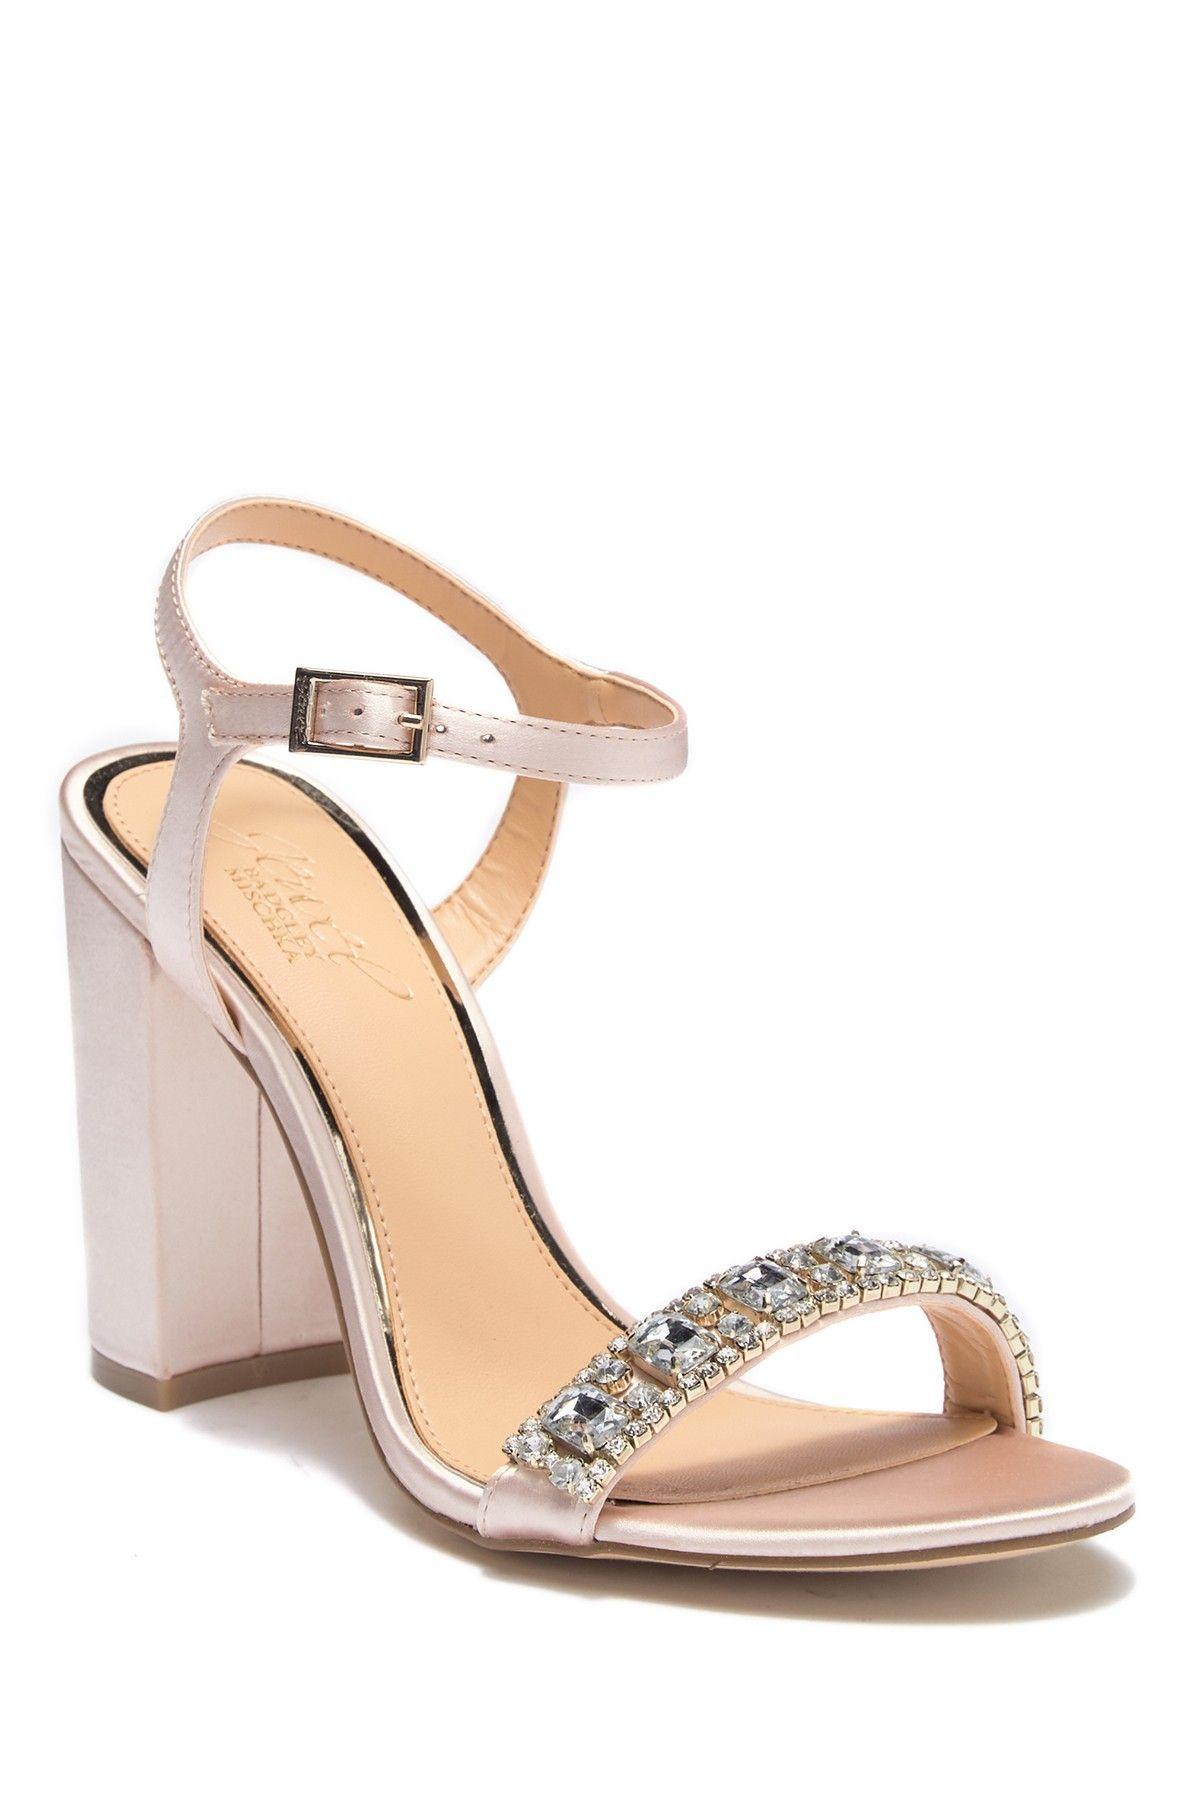 6c2ea8b04f3 Jewel Badgley Mischka - Hendricks Embellished Block Heel Sandal is now 50%  off. Free Shipping on orders over  100.